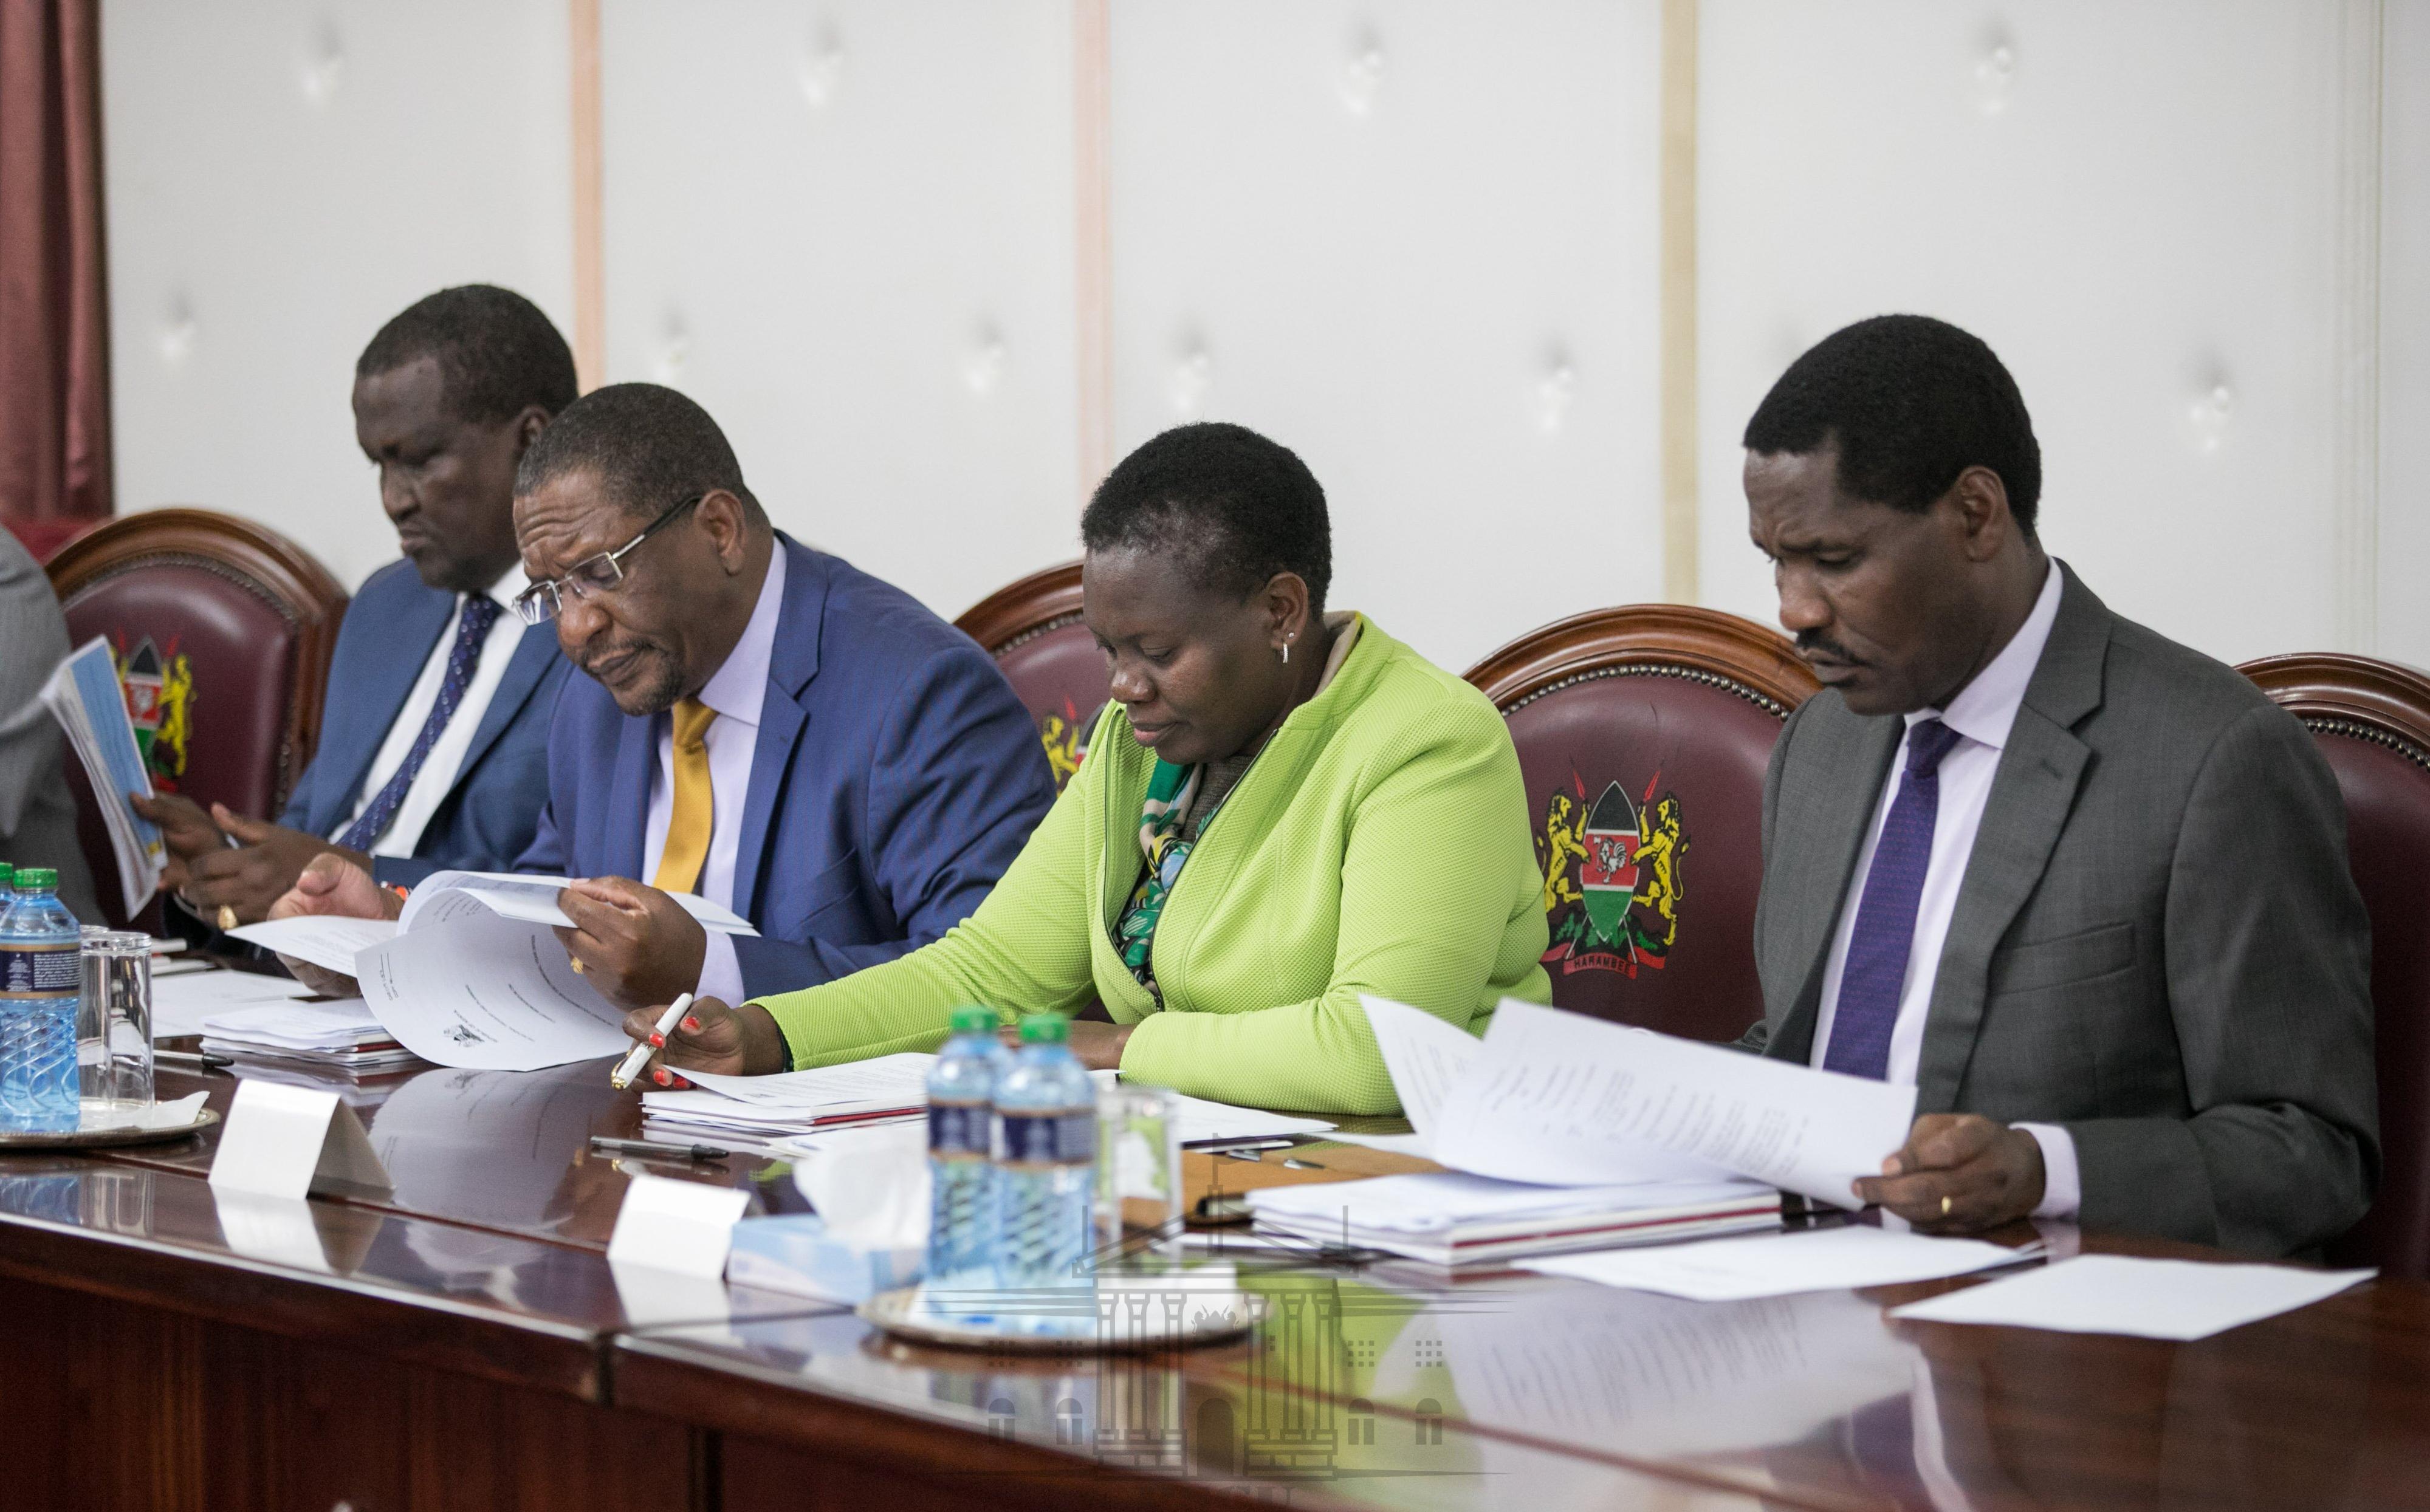 Cabinet Secretaries salaries www.businesstoday.co.ke